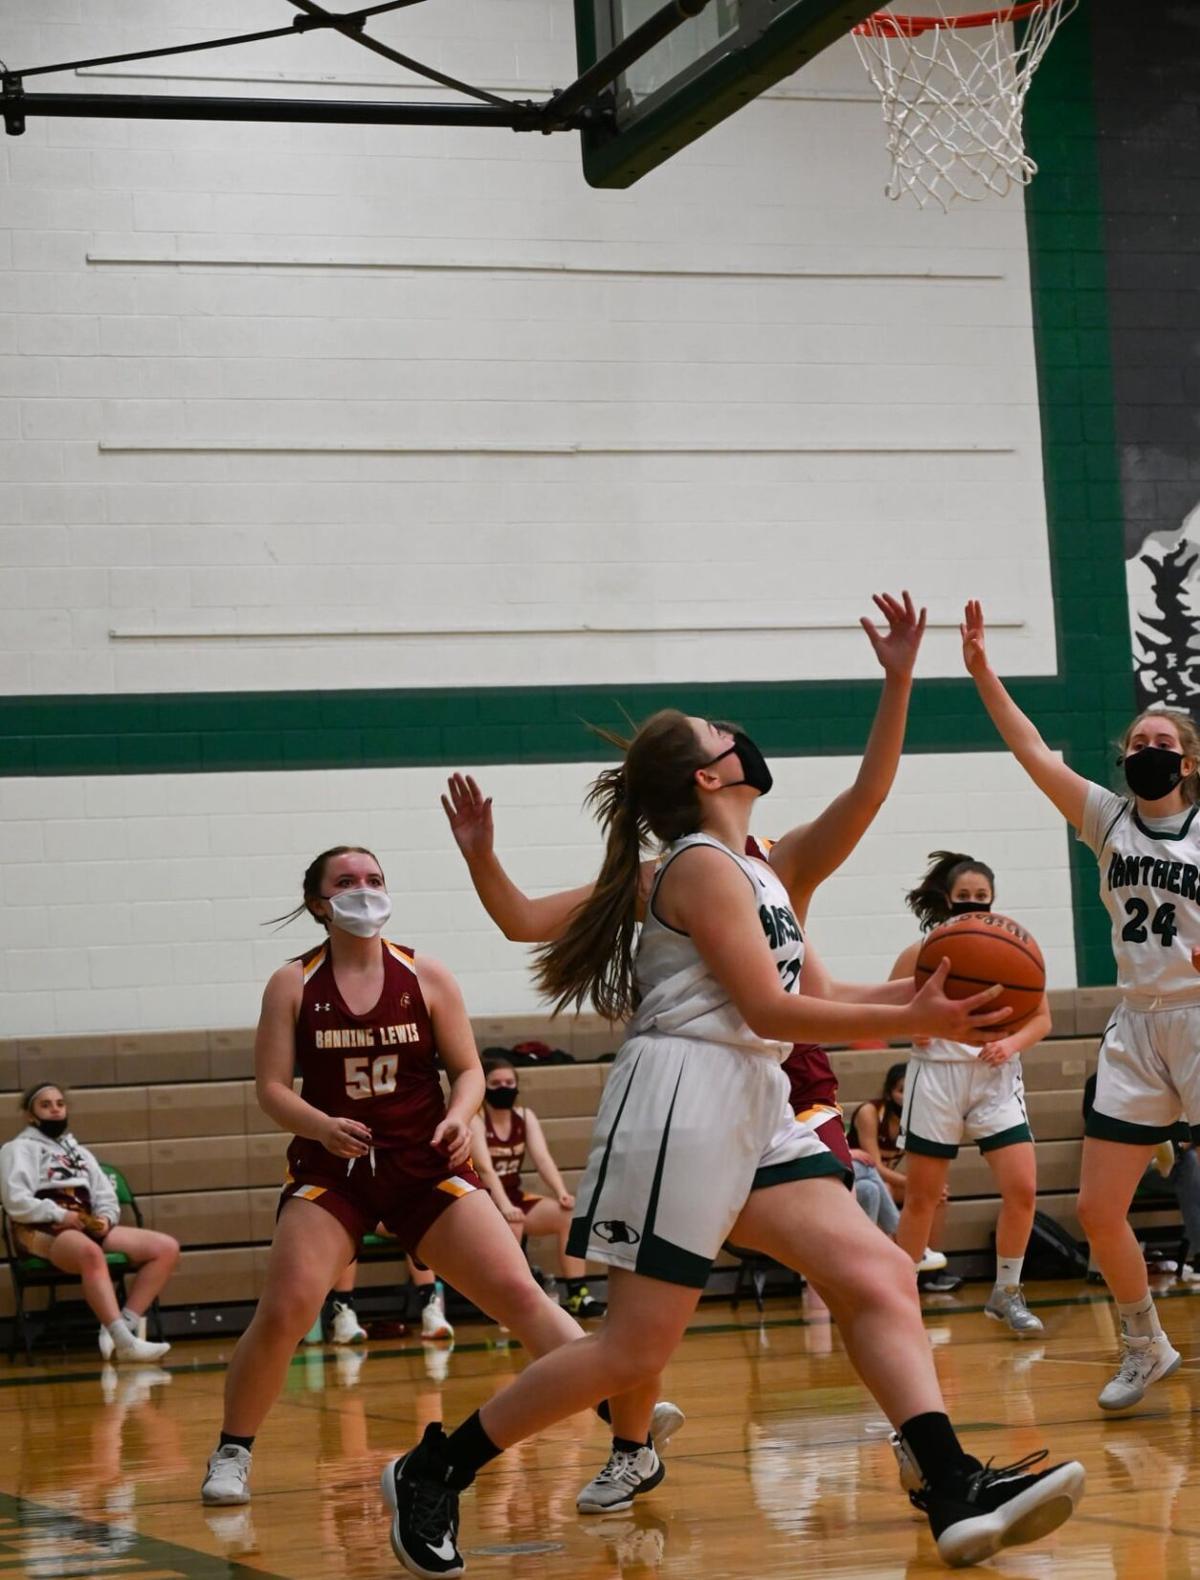 Woodland Park girls' basketball triumph, boys fall short